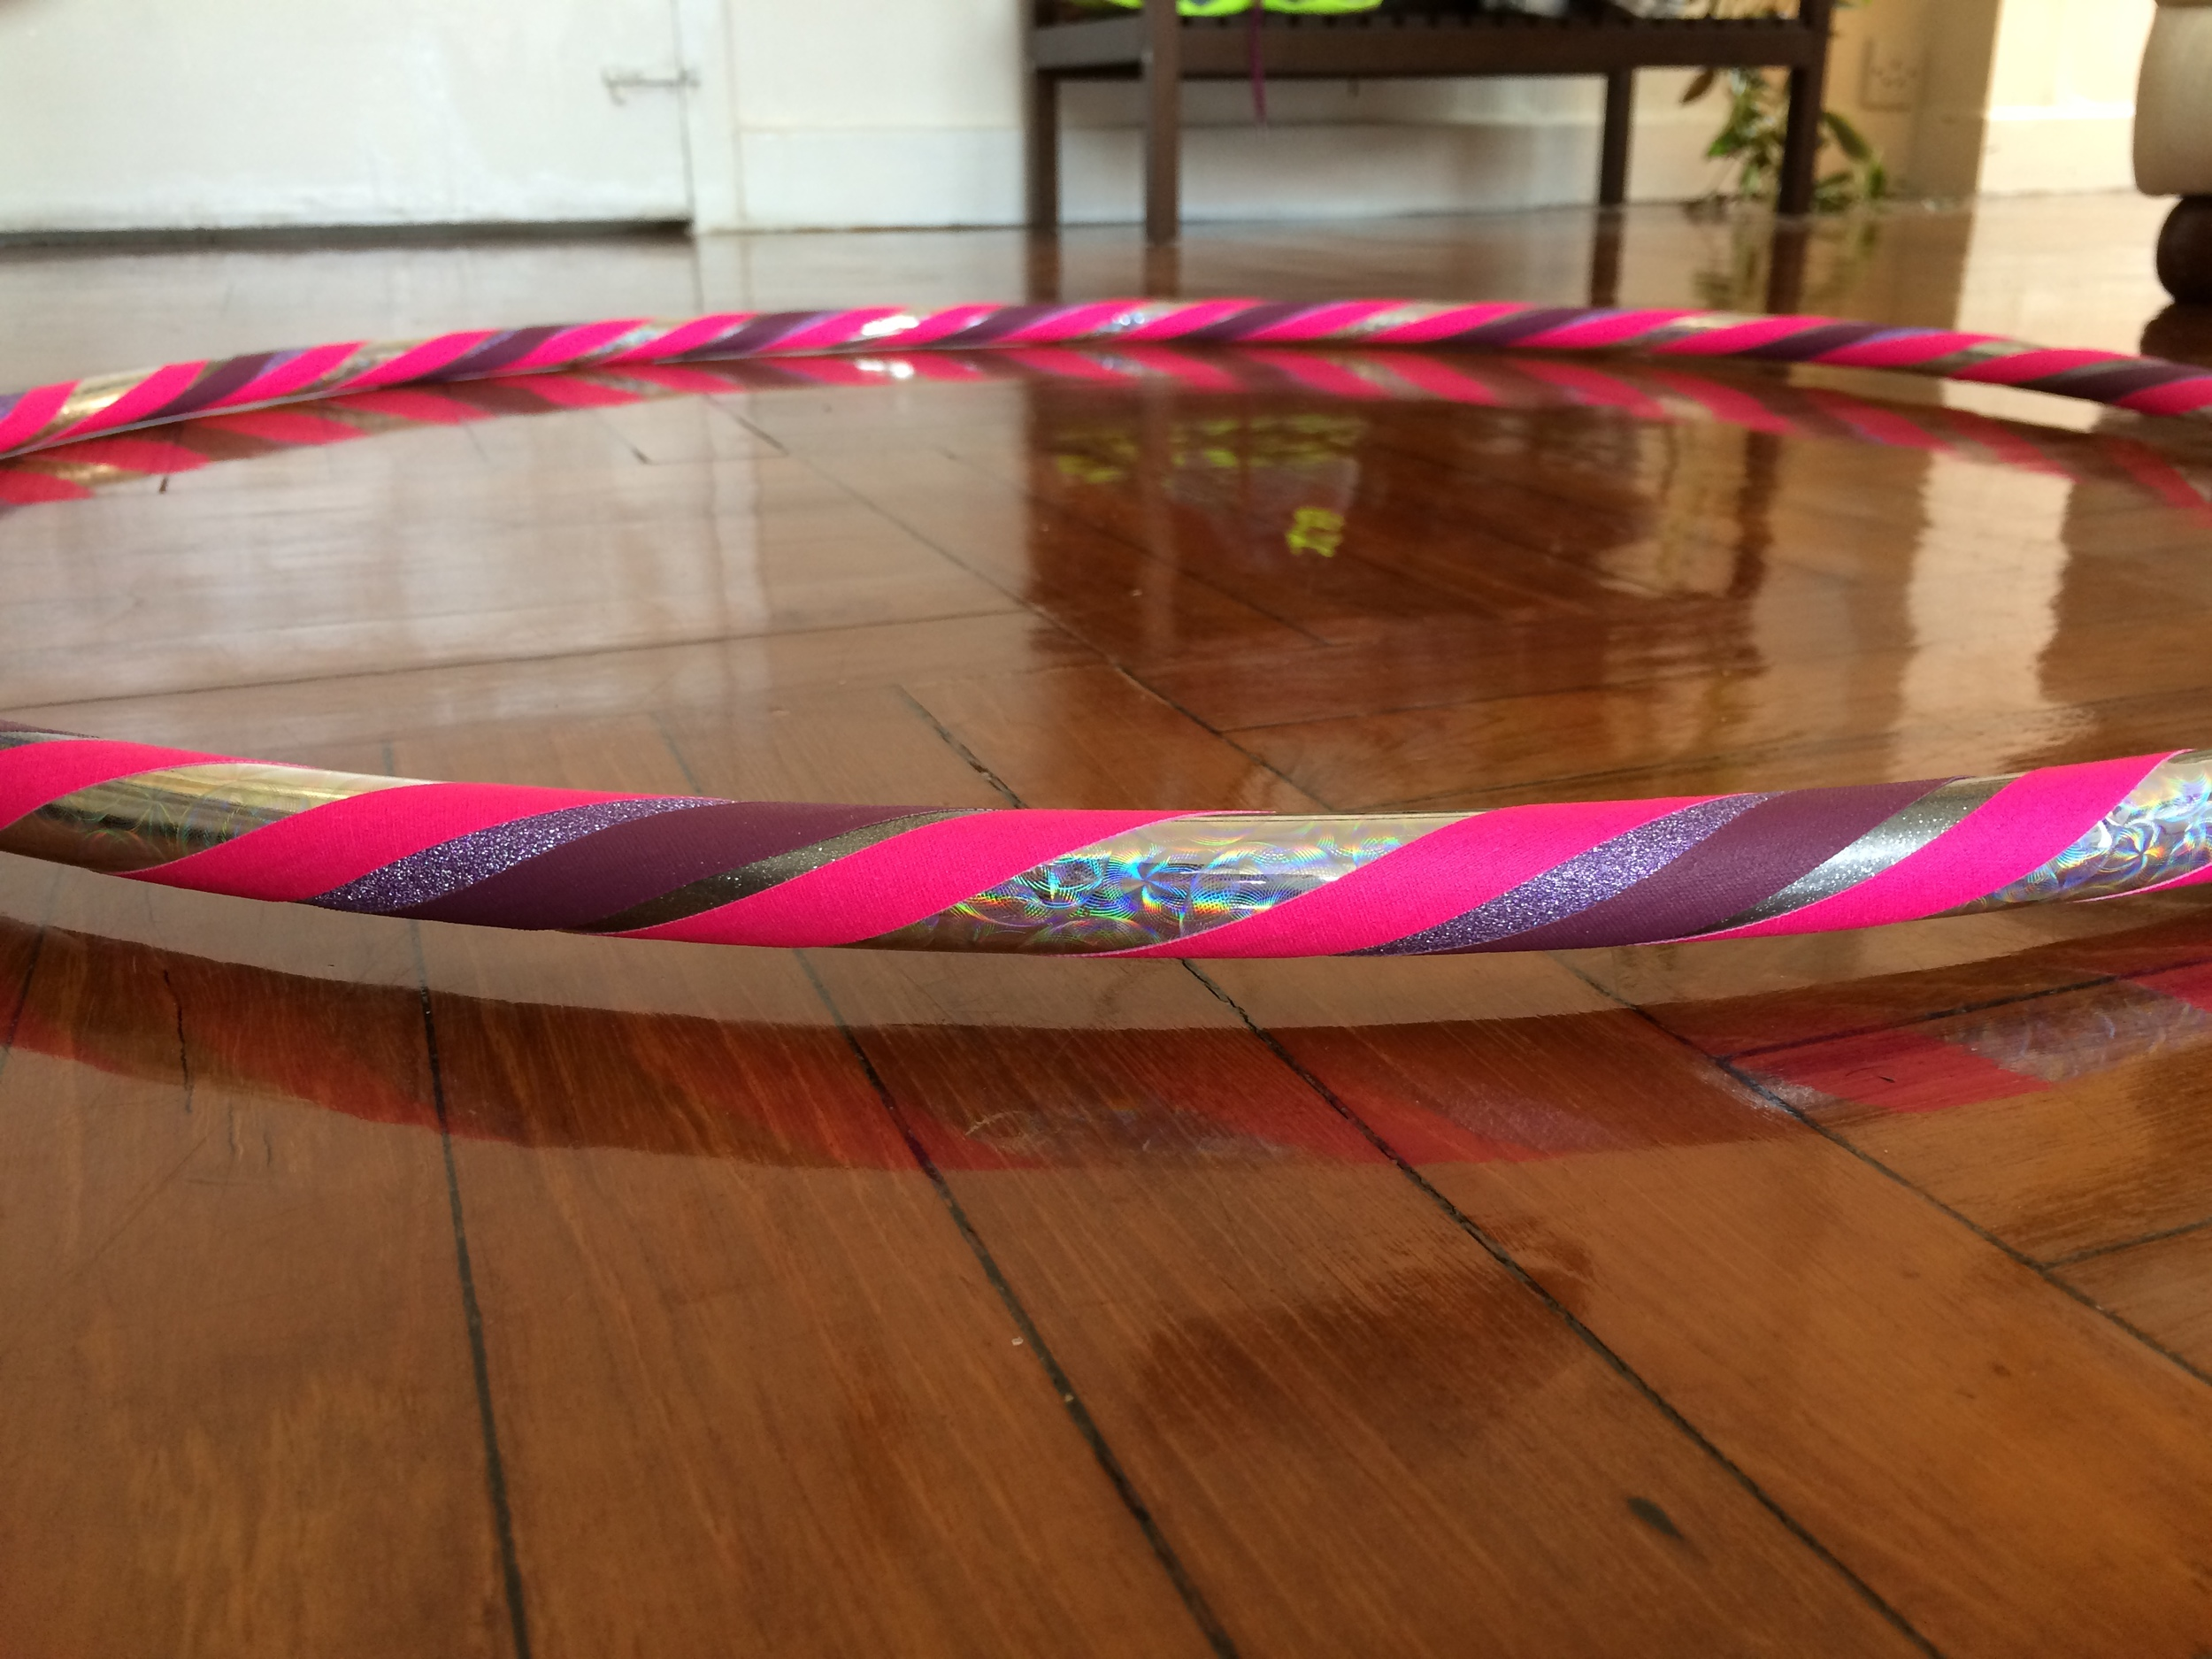 buy a hula hoop hong kong 購買香港呼啦圈